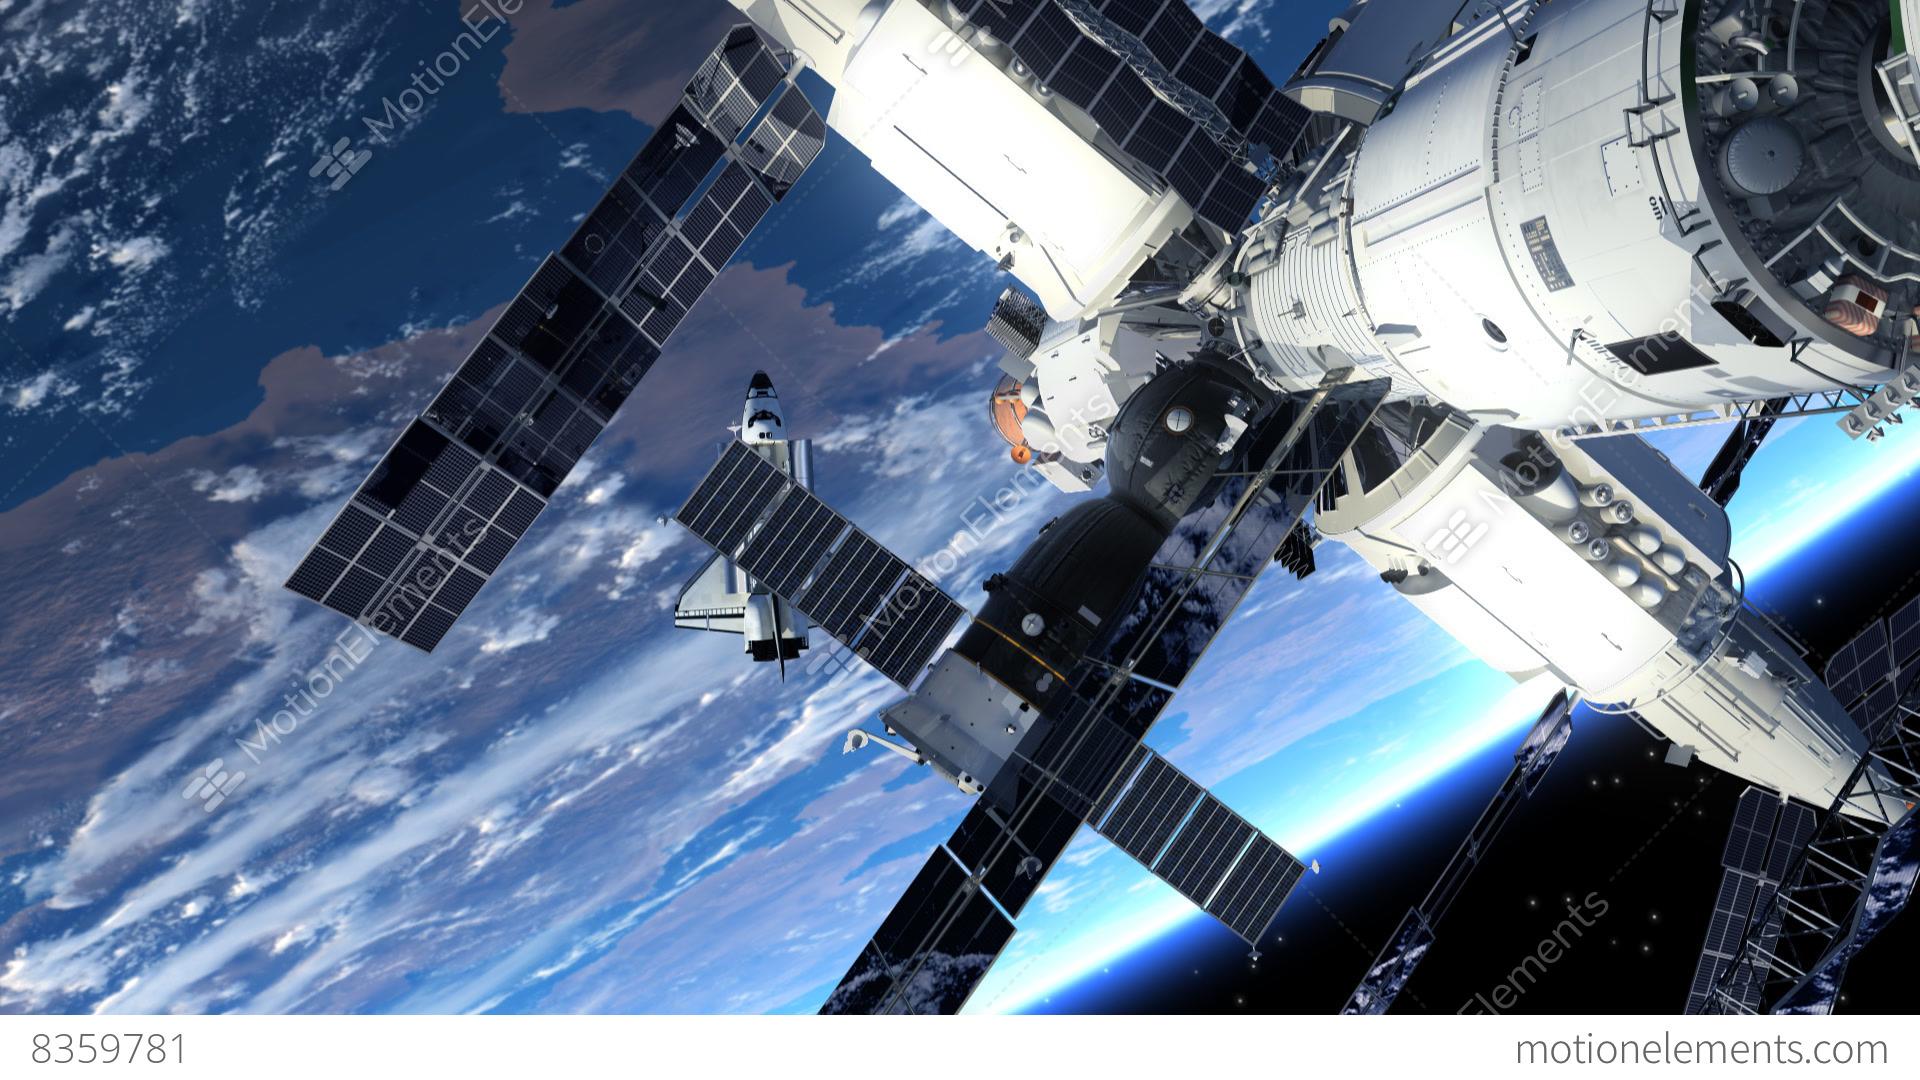 astronaut orbiting space station - photo #4